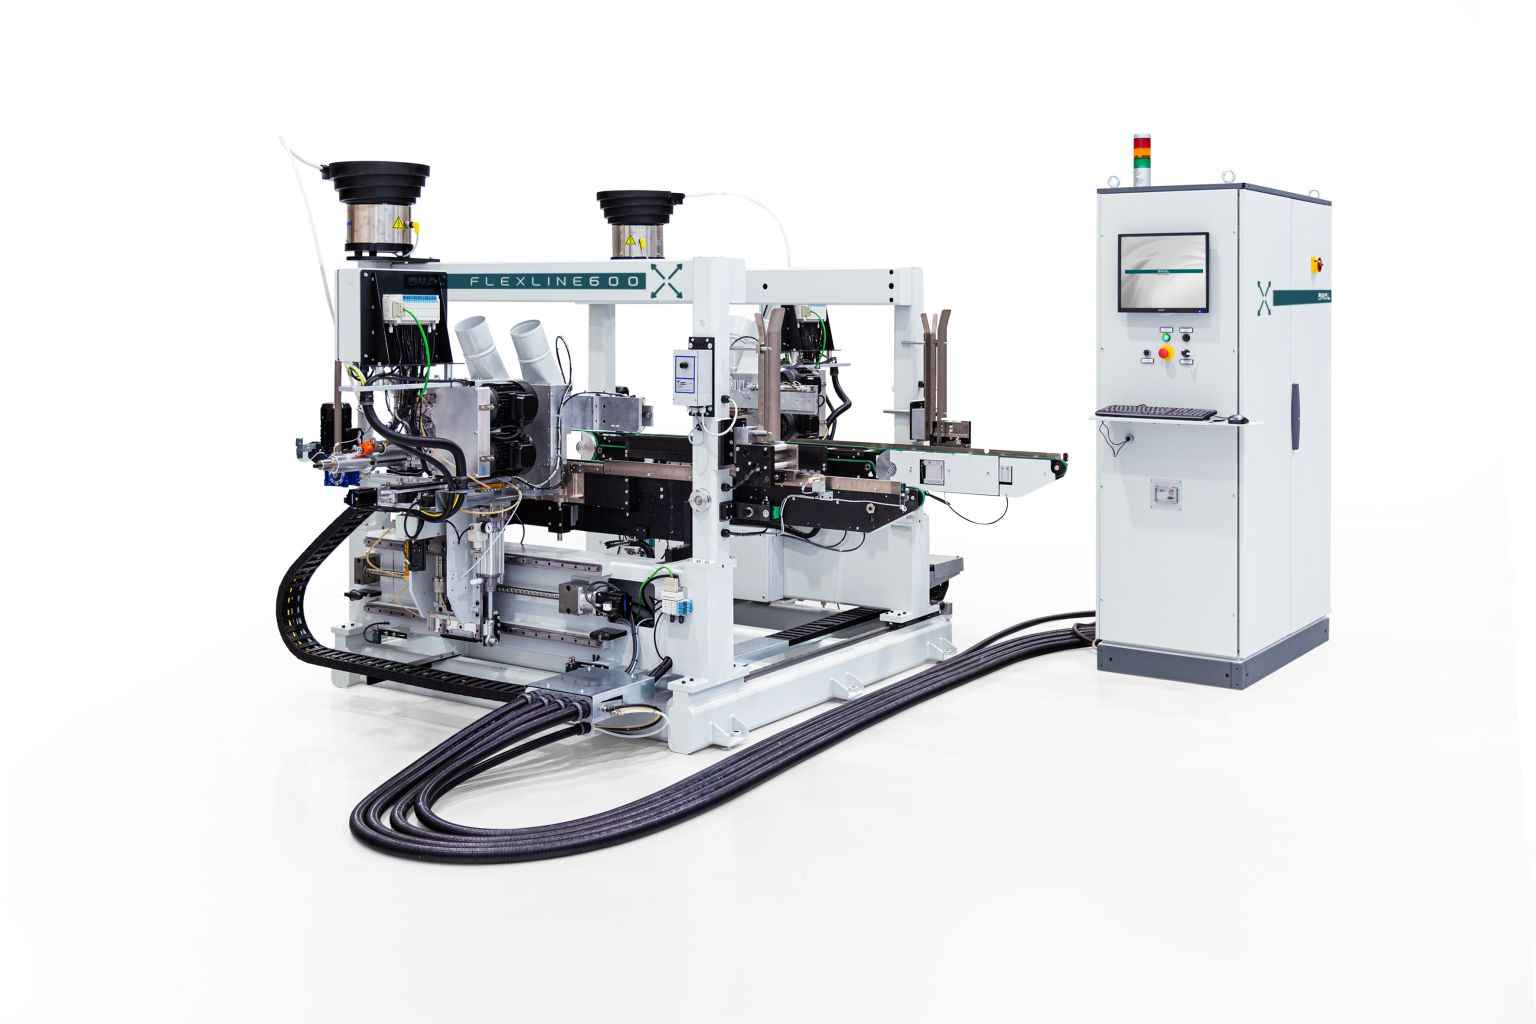 CNC DRILLING MACHINE - FLEXLINE 600